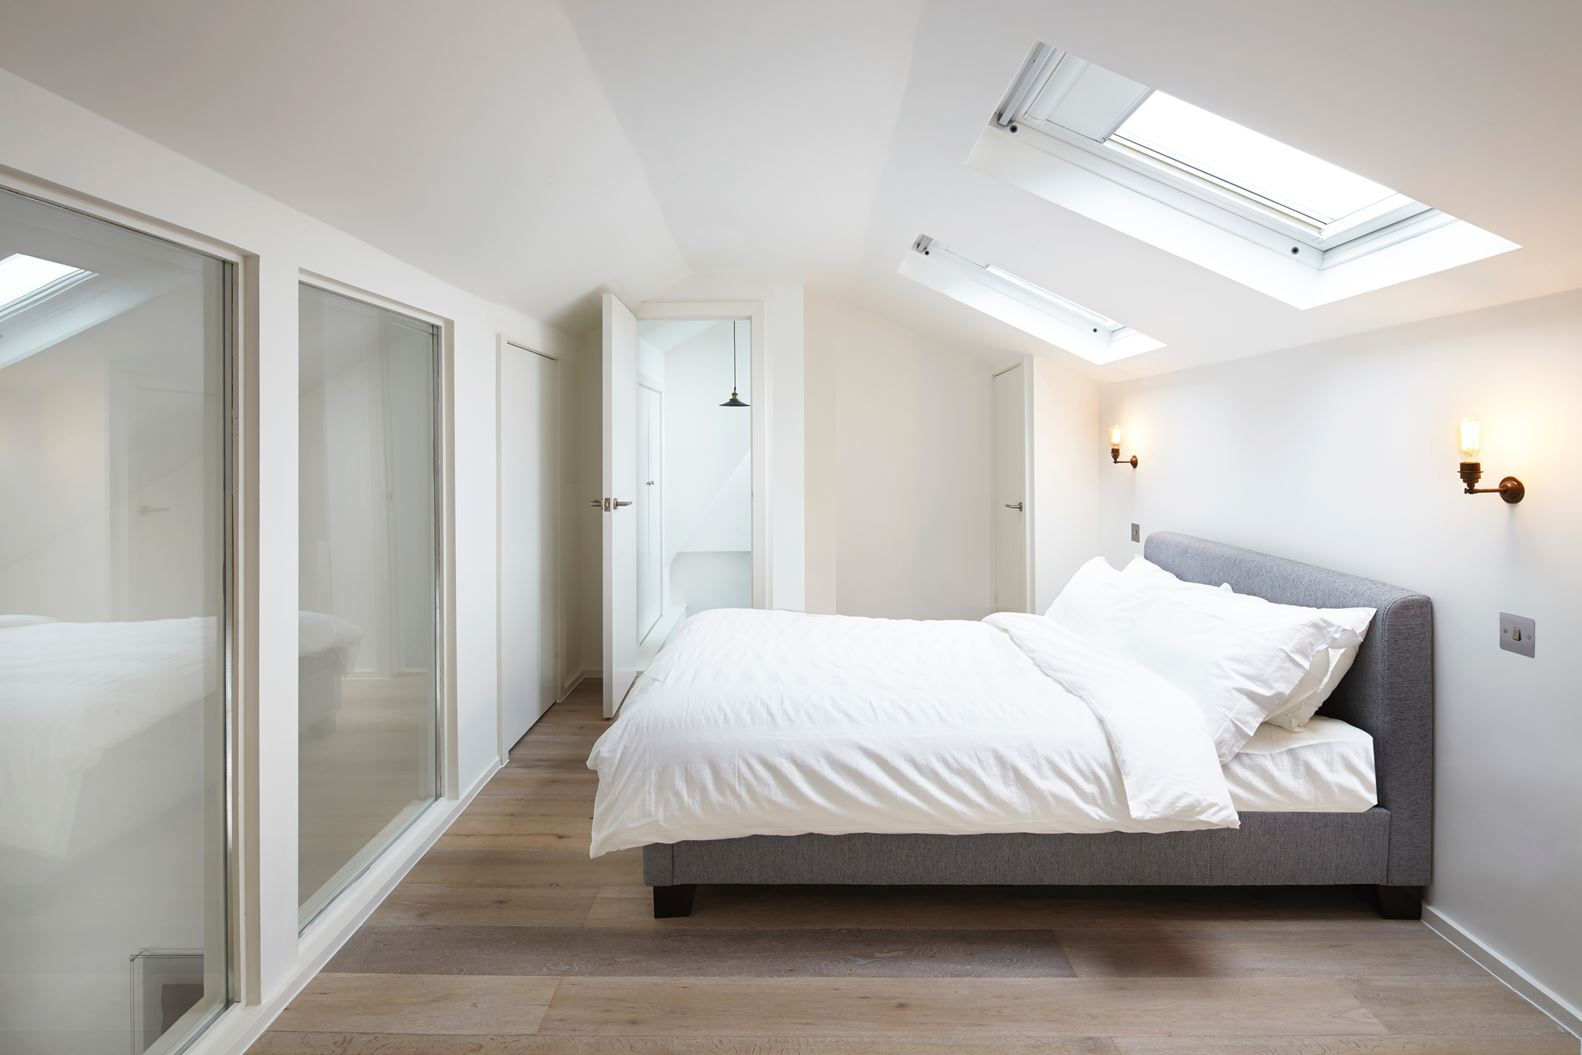 Un attico moderno in un palazzo antico   mansarda.it